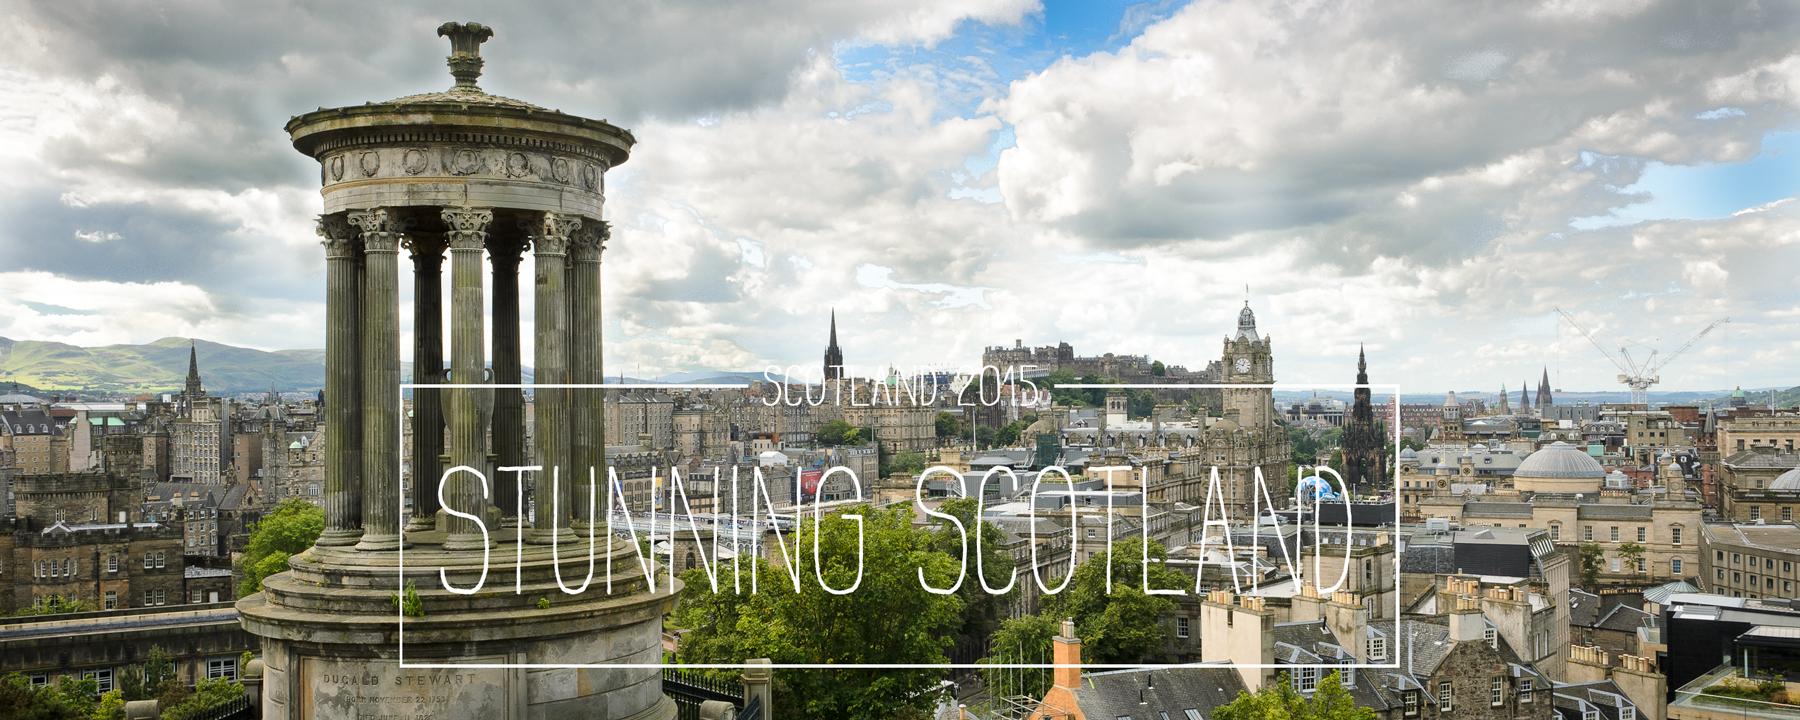 My stunning Scotland